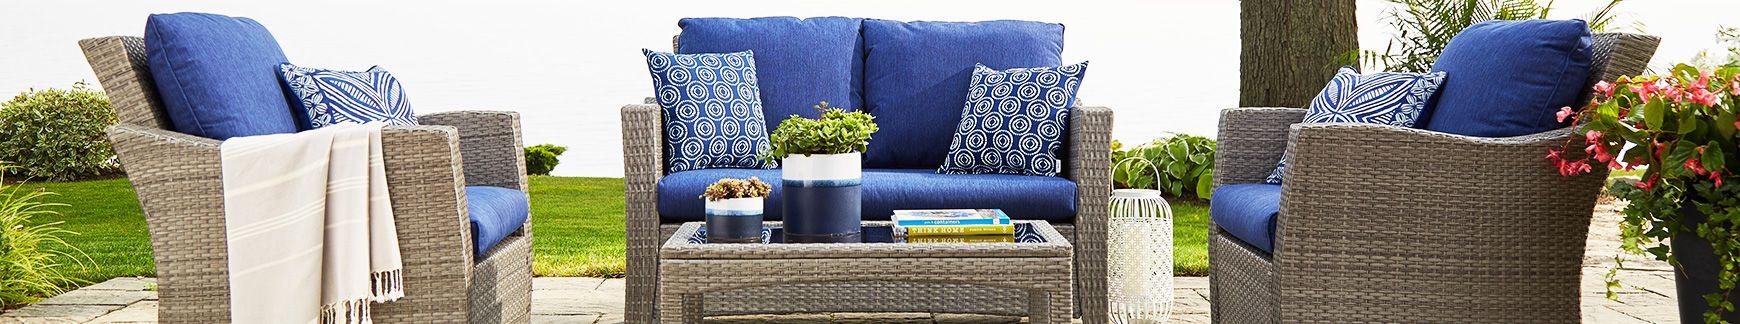 outdoor ikea furniture ll h kungsholmen patio rattan lounge pin ivory black garden